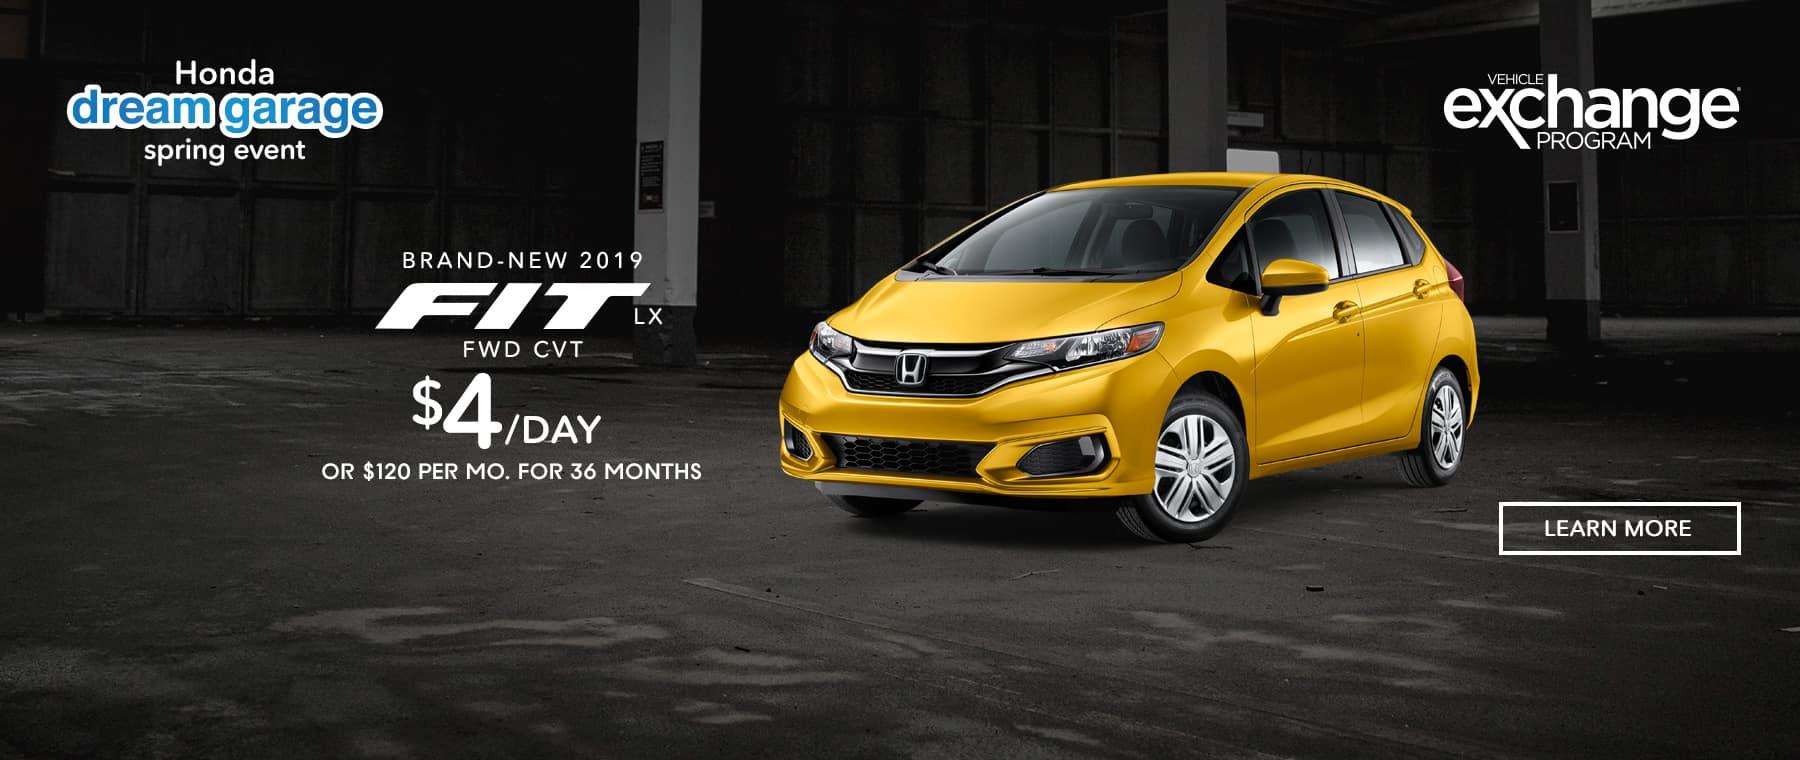 Paragon Honda Service Center >> Paragon Honda: New Honda and Used Car Dealer in Woodside, NY